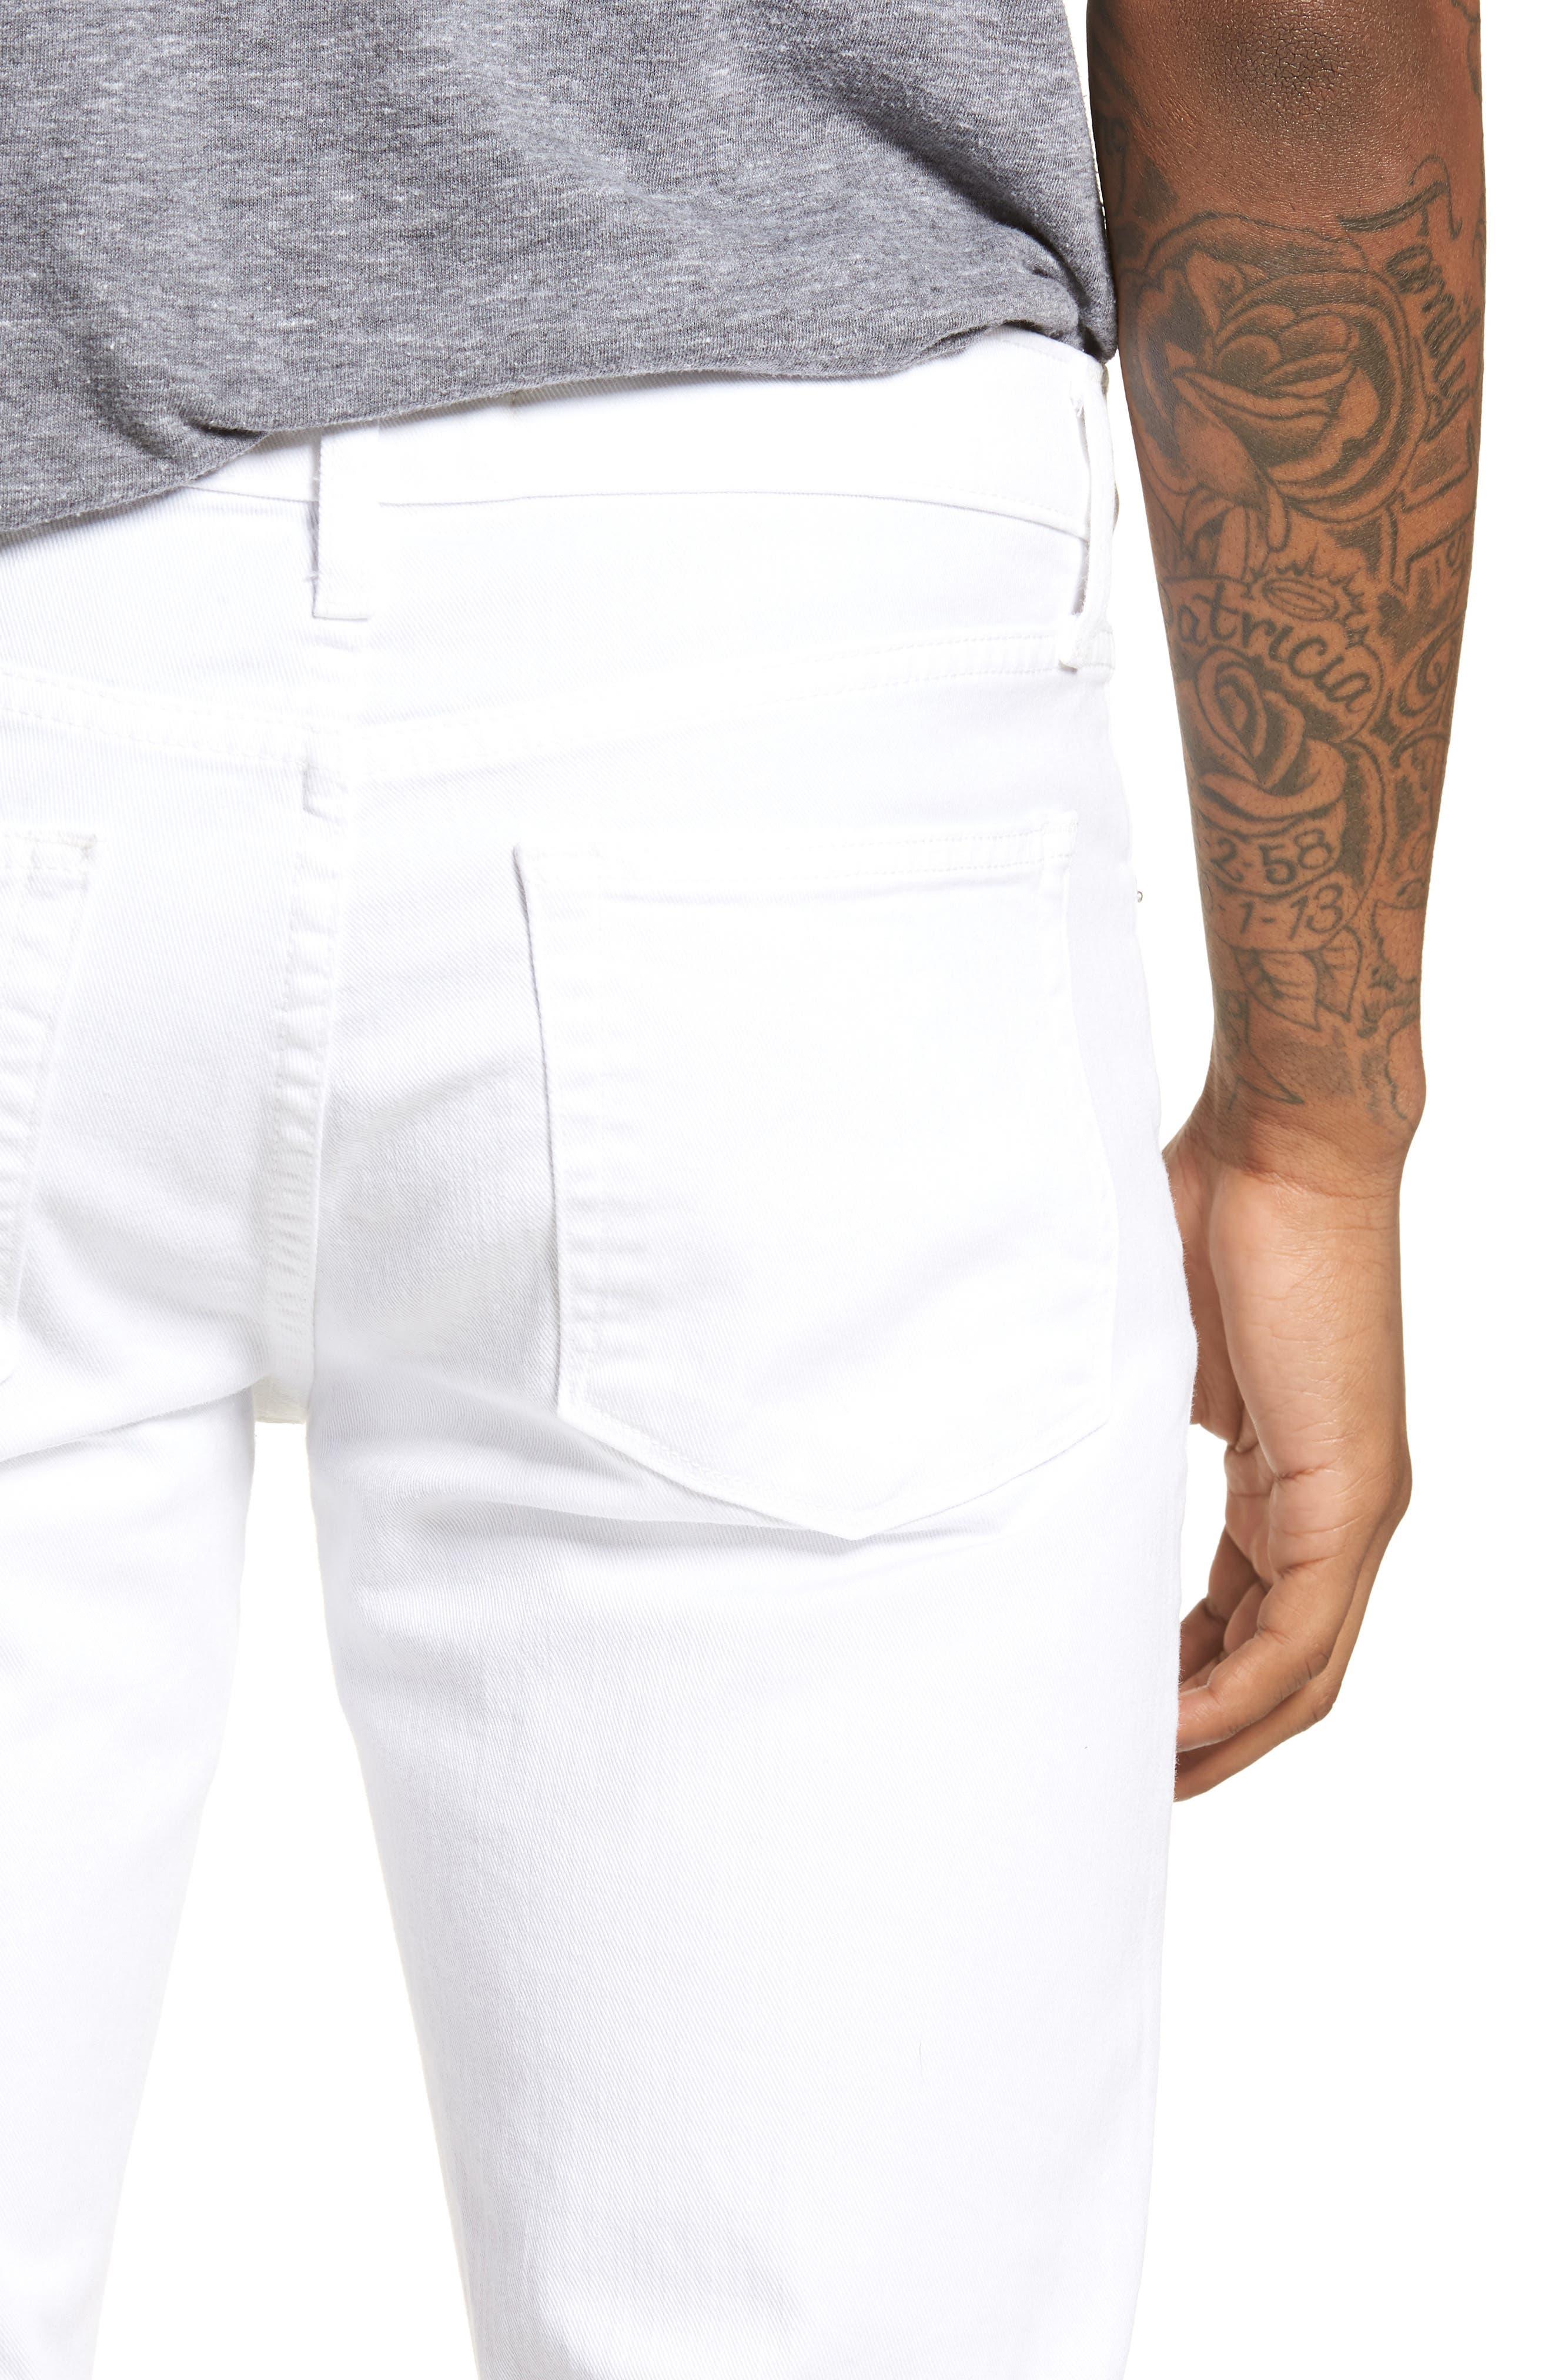 Mick Distressed Skinny Fit Jeans,                             Alternate thumbnail 4, color,                             WHITMAN OAK